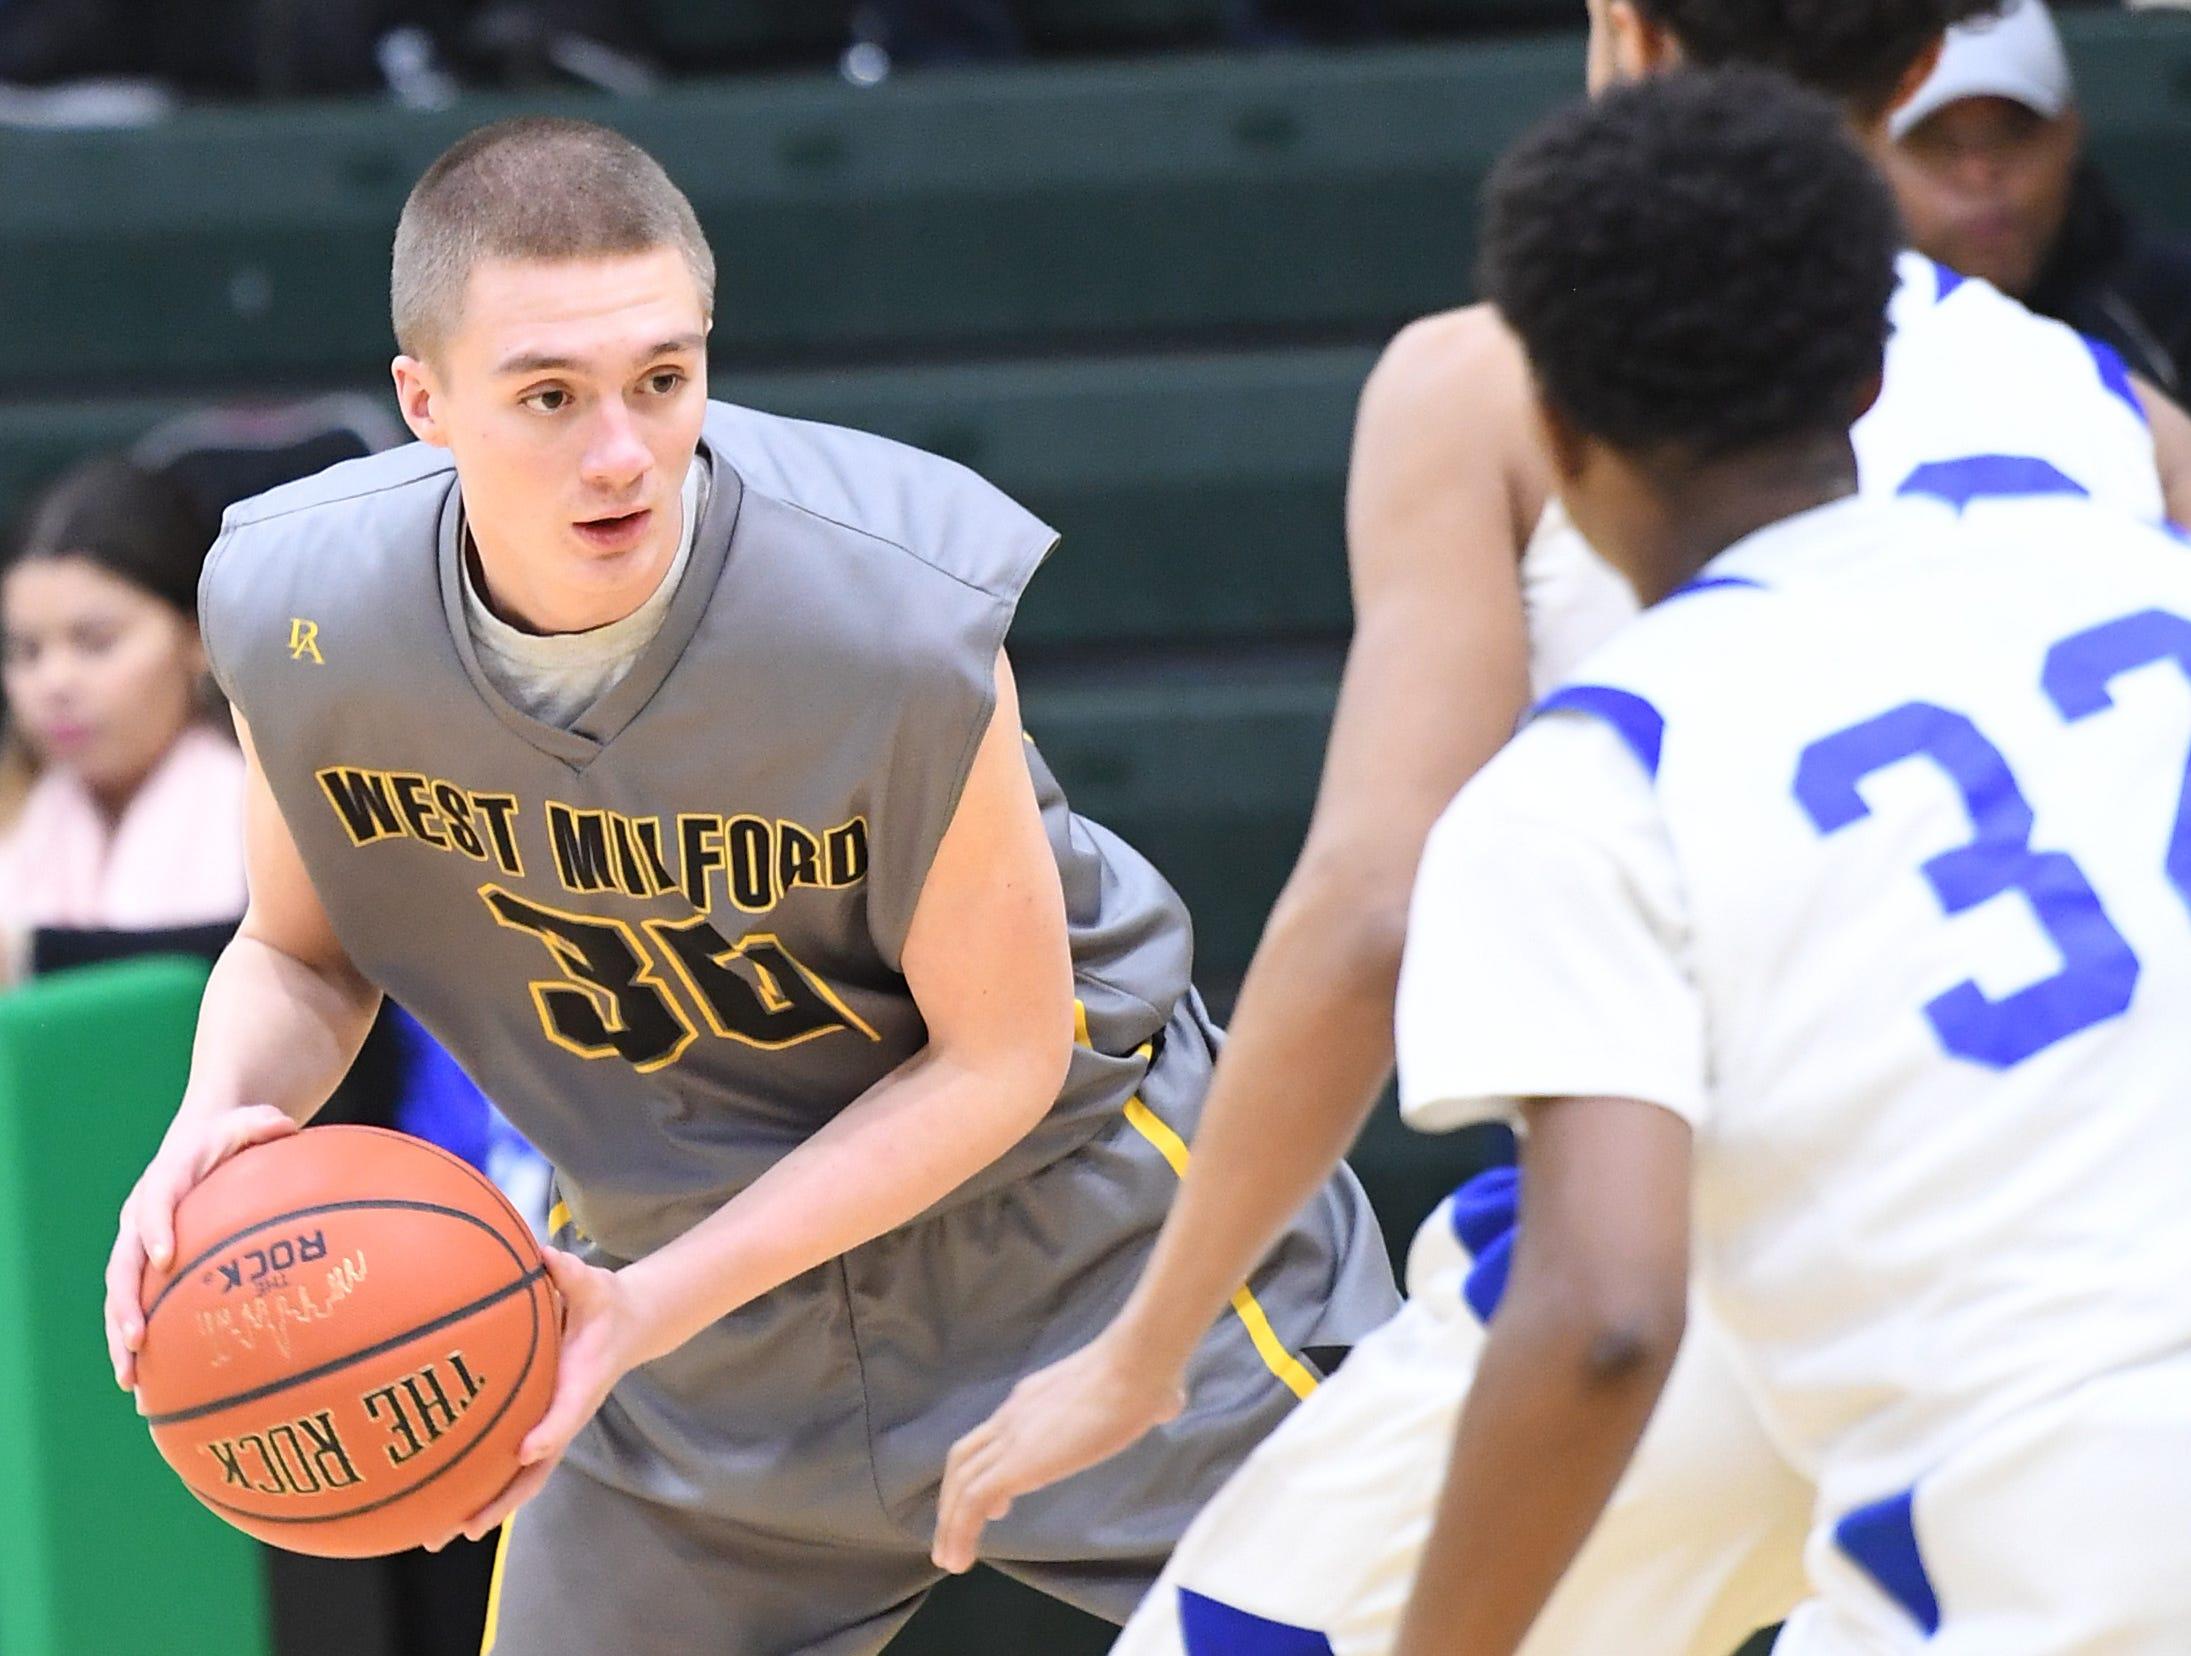 Public vs. Private Basketball Showcase at St. Joseph High School in Montvale on Saturday, January 12, 2019. West Milford vs. St. Mary. WM #30 Josiah Basket.